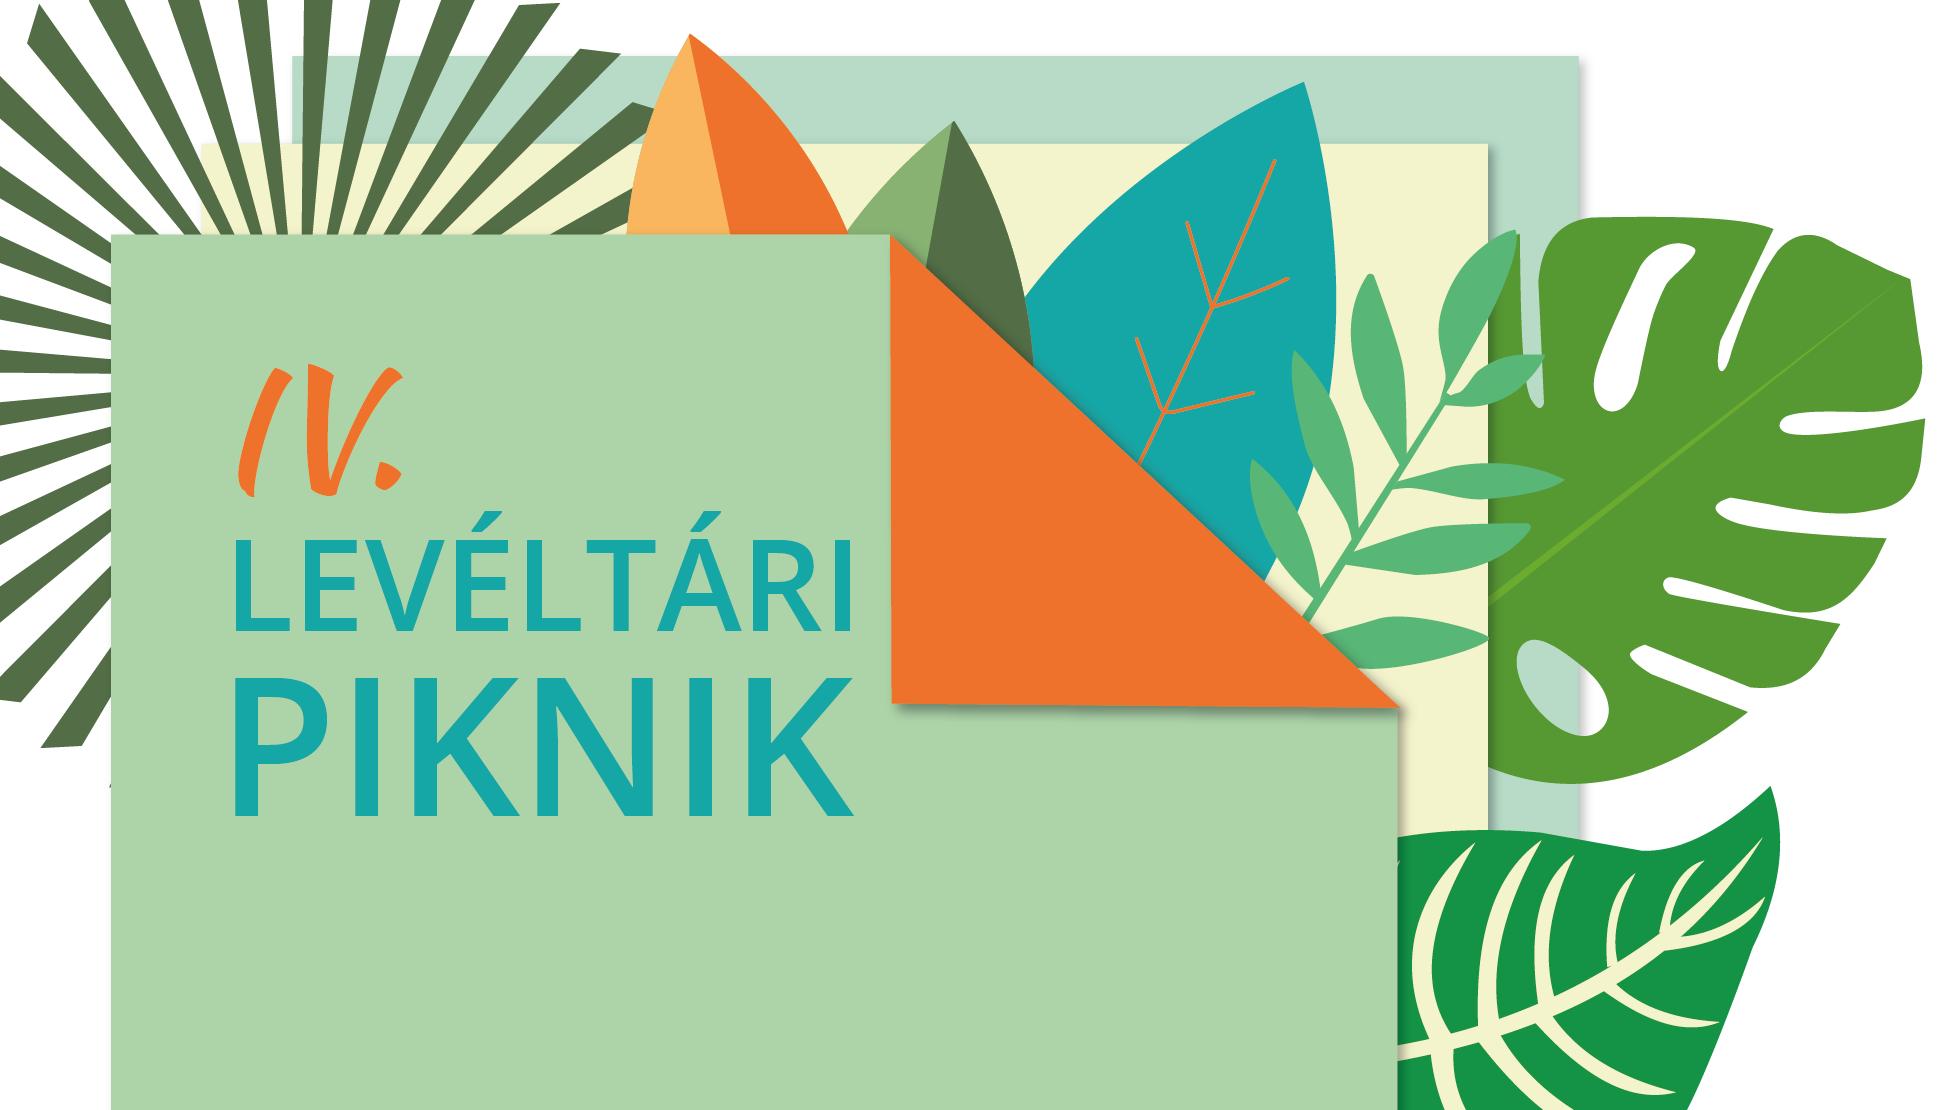 leveltaripiknik_banner_honlap-05.png